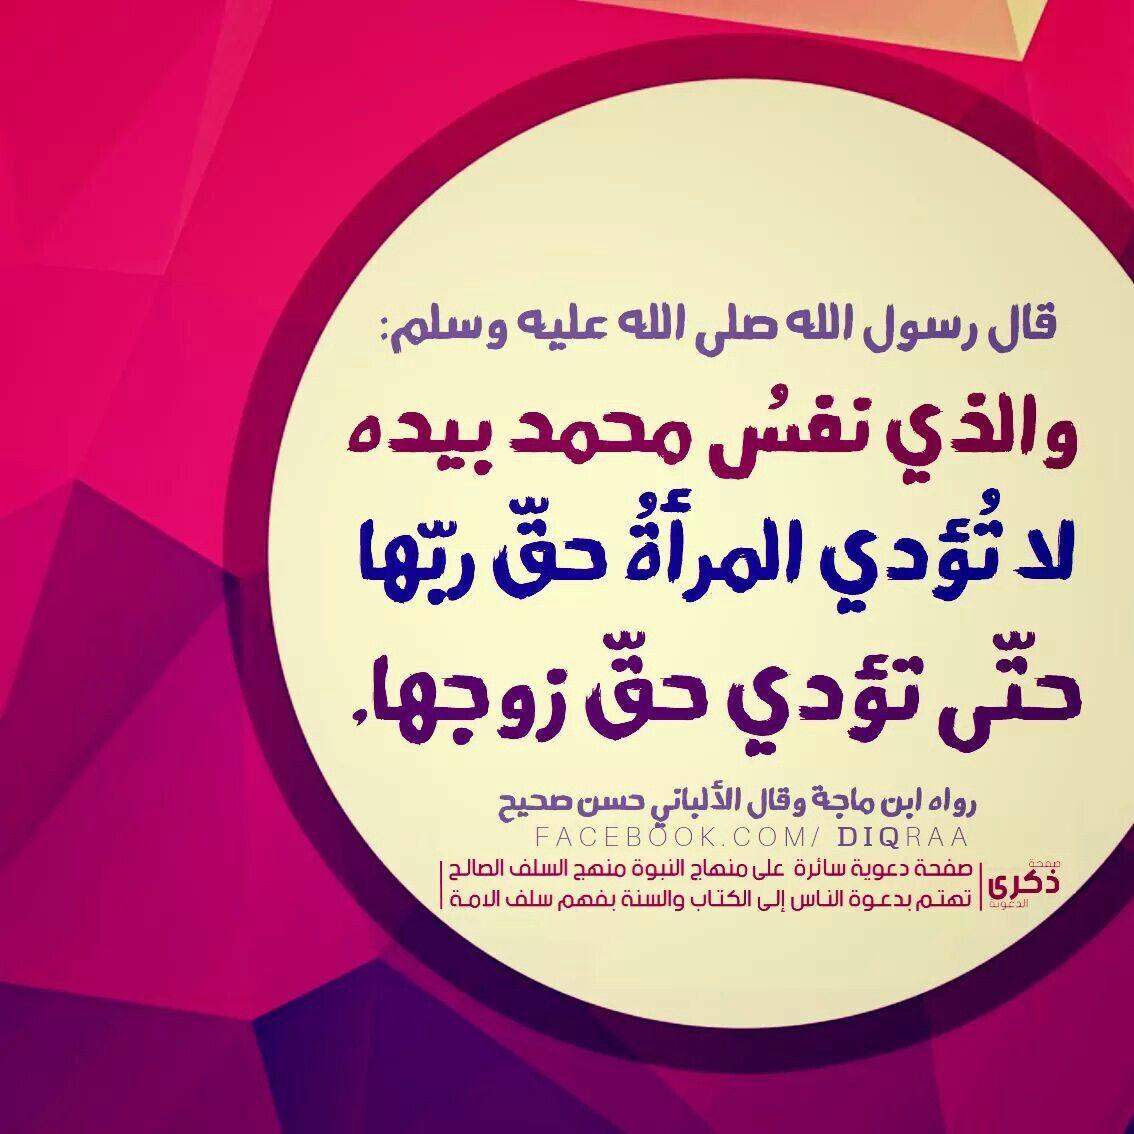 Pin By وسارعوا Wa Sare3o On حديث شريف Instagram Photo And Video Instagram Photo